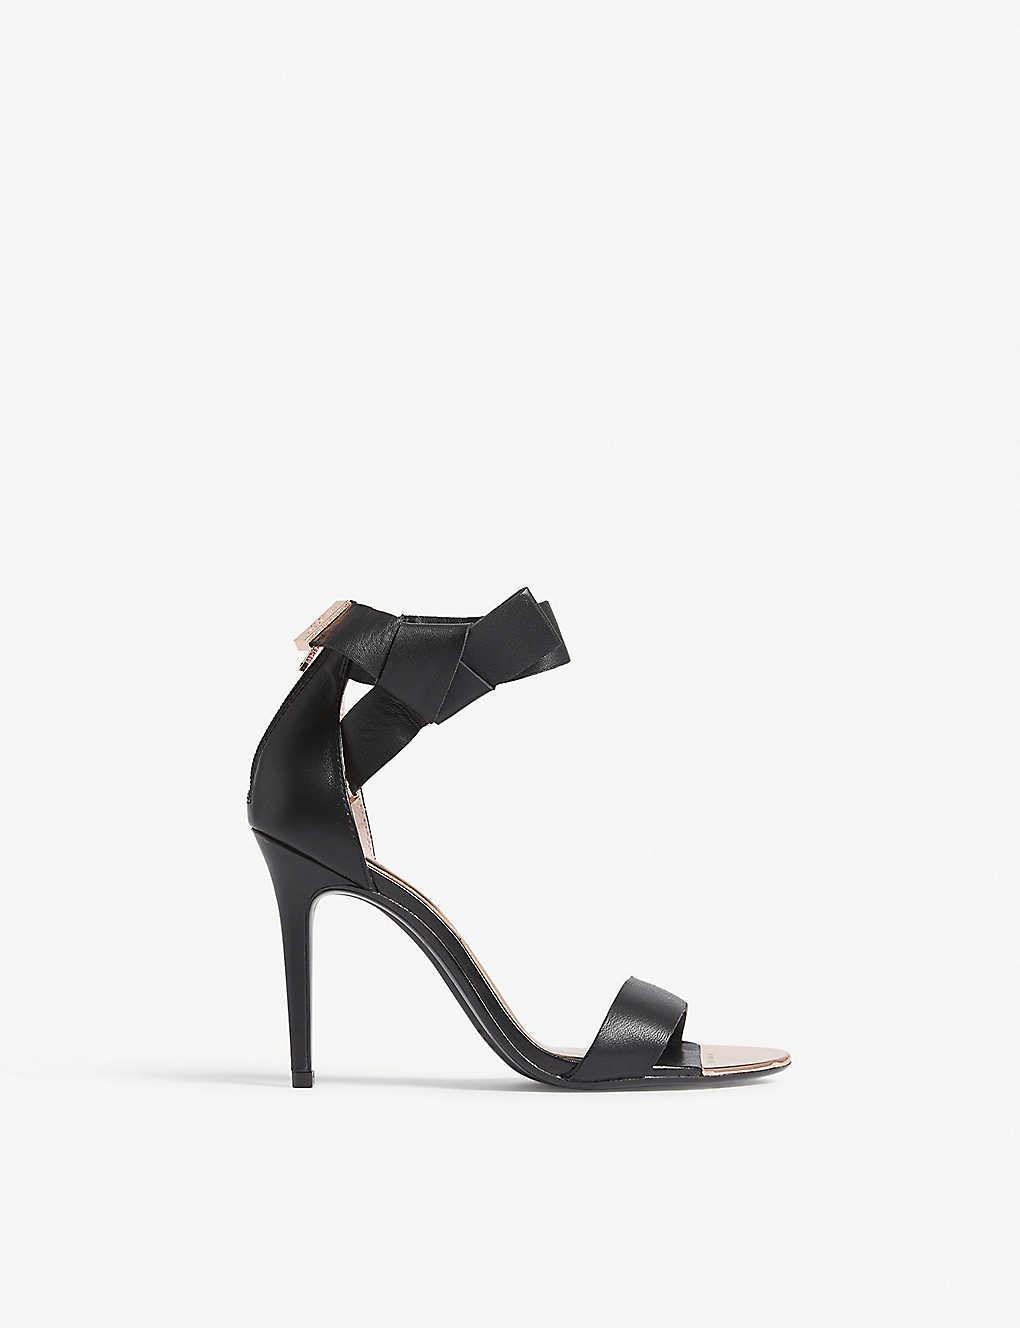 265dc5ba9f2c TED BAKER - Saphrun leather sandals